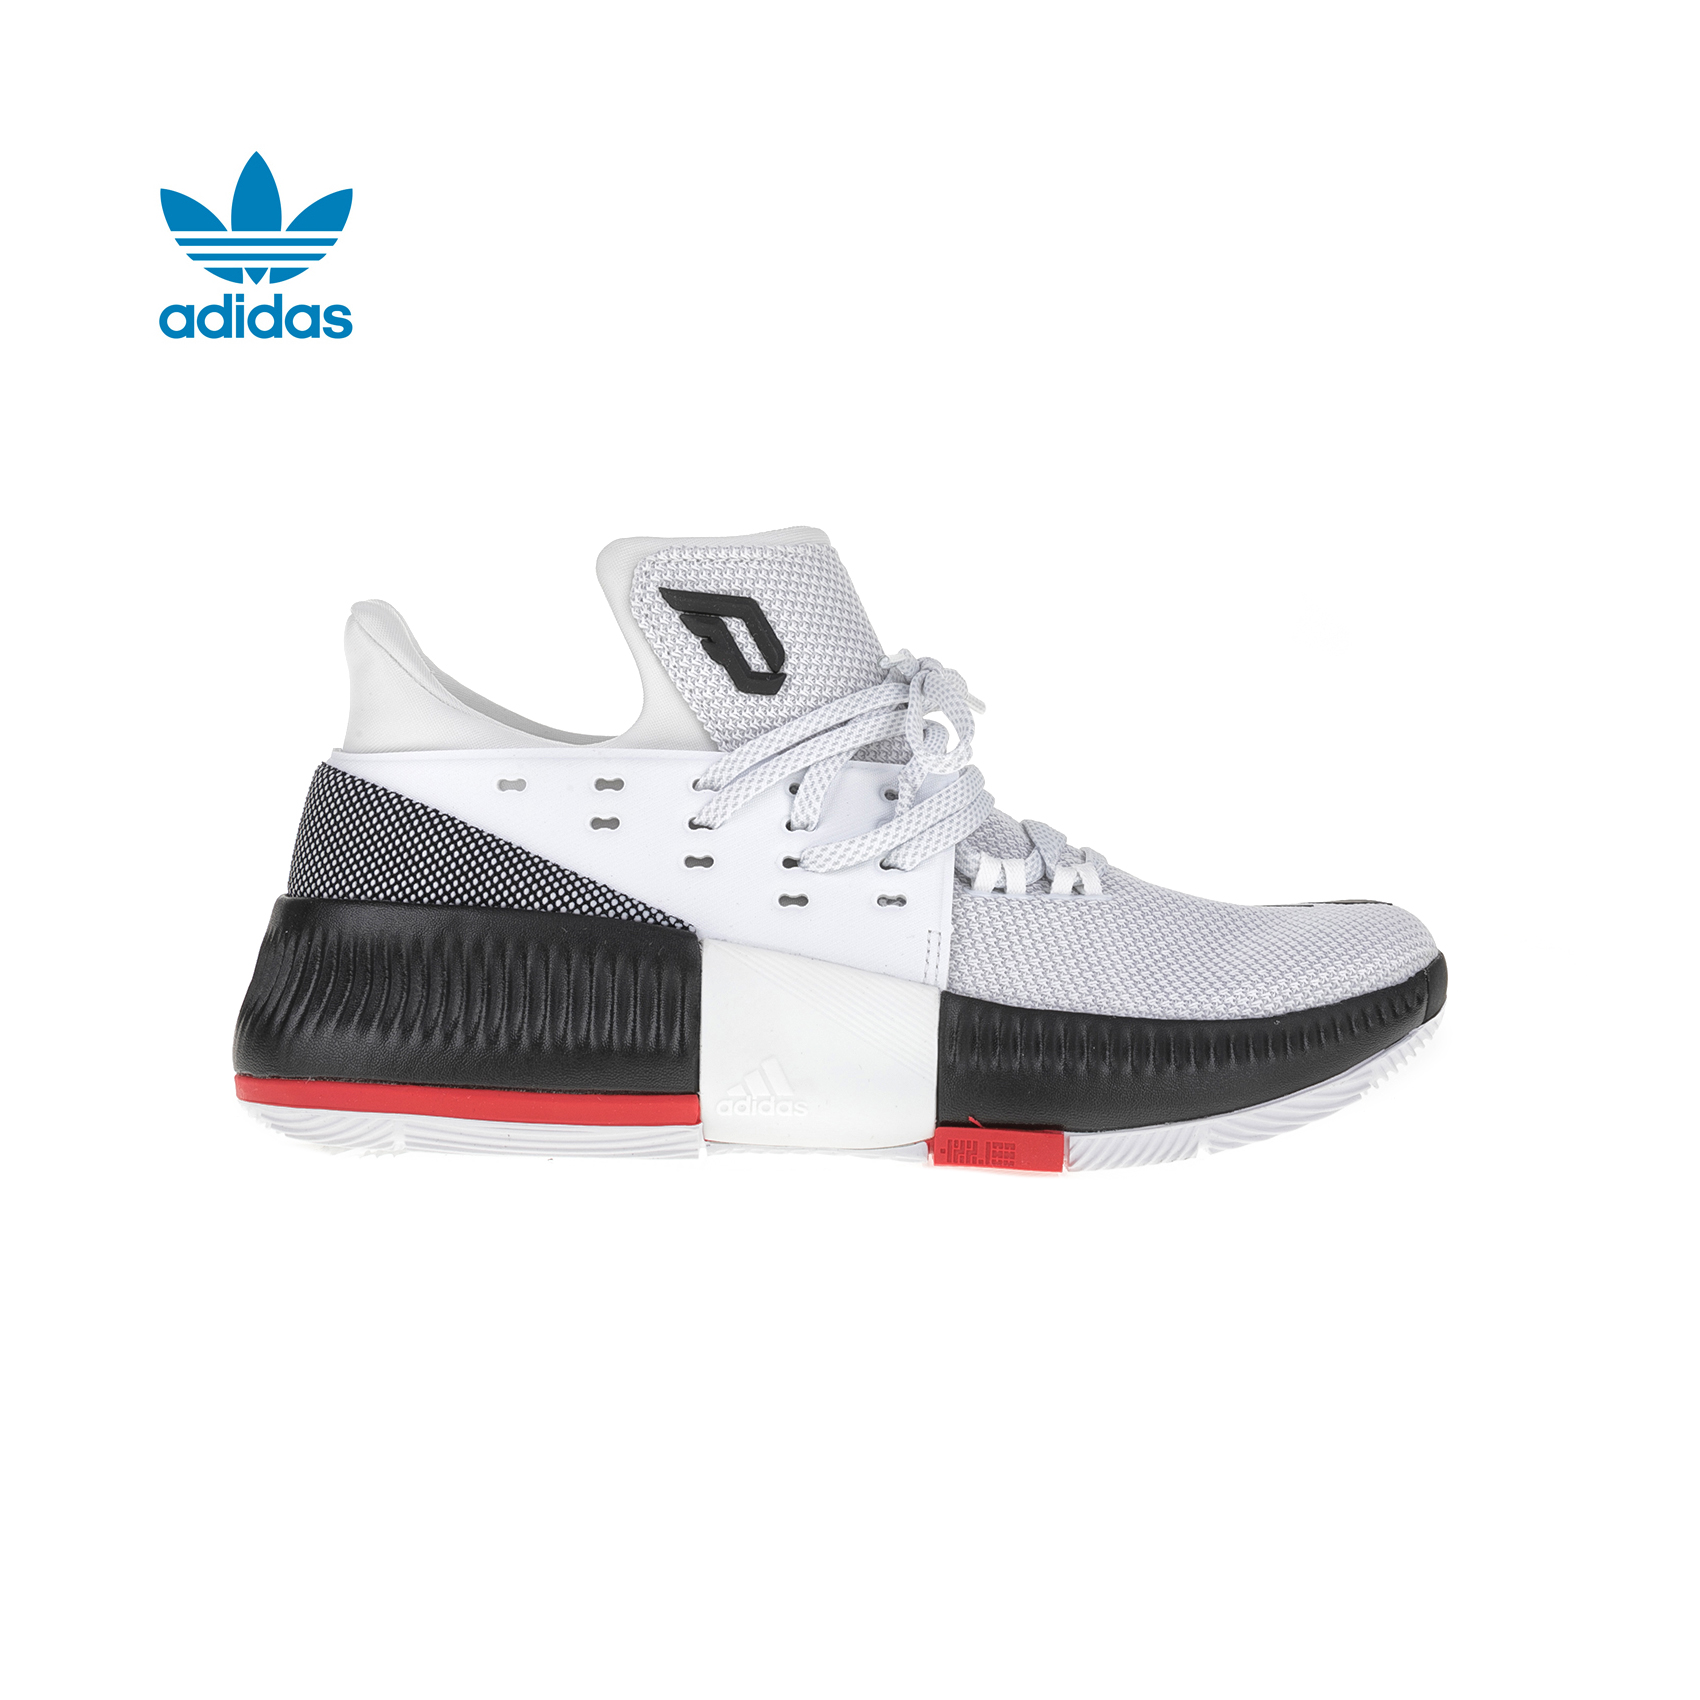 best service 6c885 ca857 adidas Originals - Παιδικά παπούτσια μπάσκετ adidas Crazy Time J λευκά